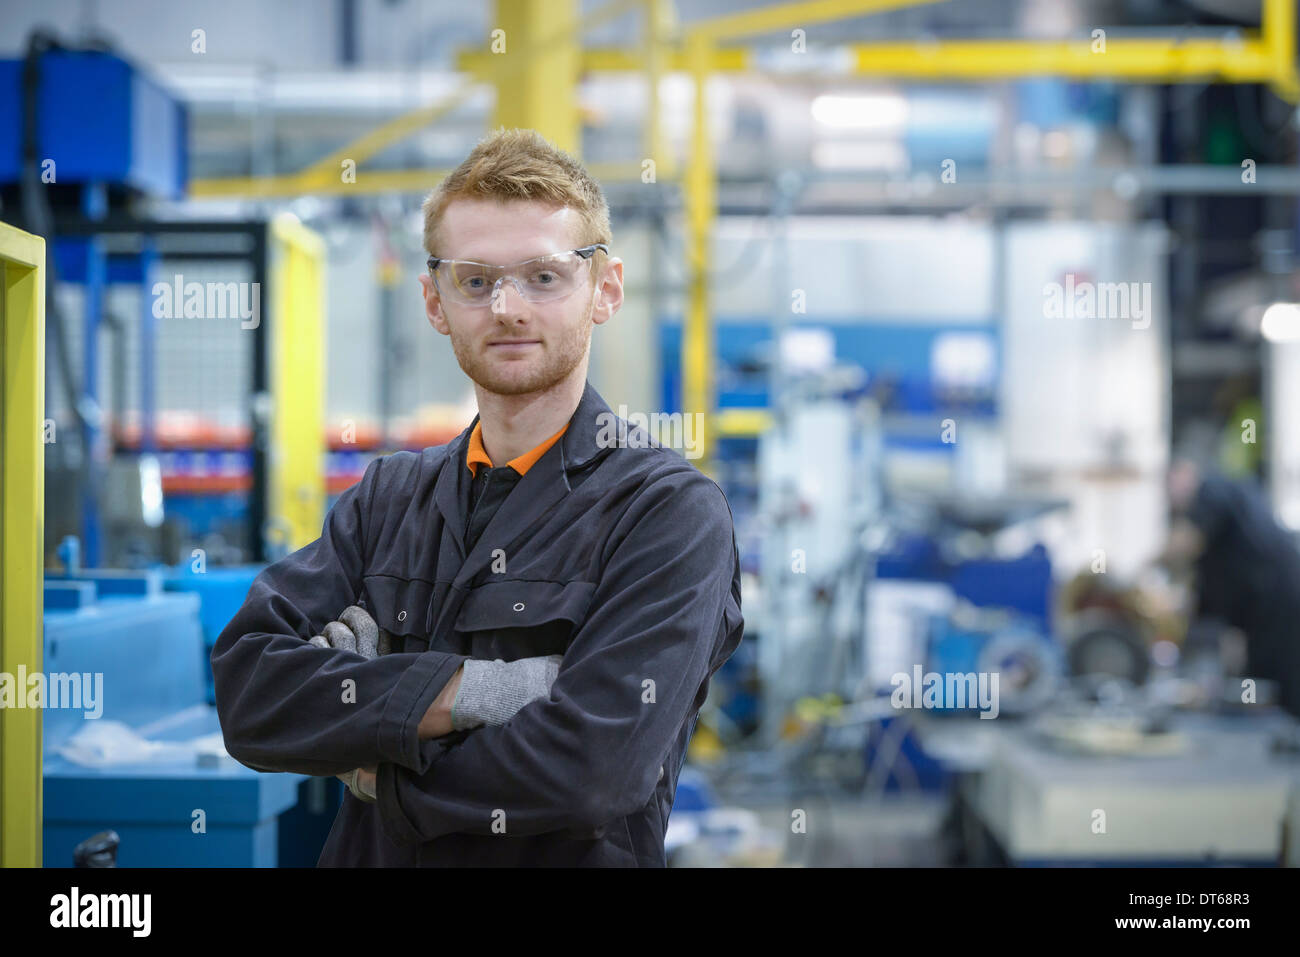 Portrait of engineering apprentice in engineering factory - Stock Image